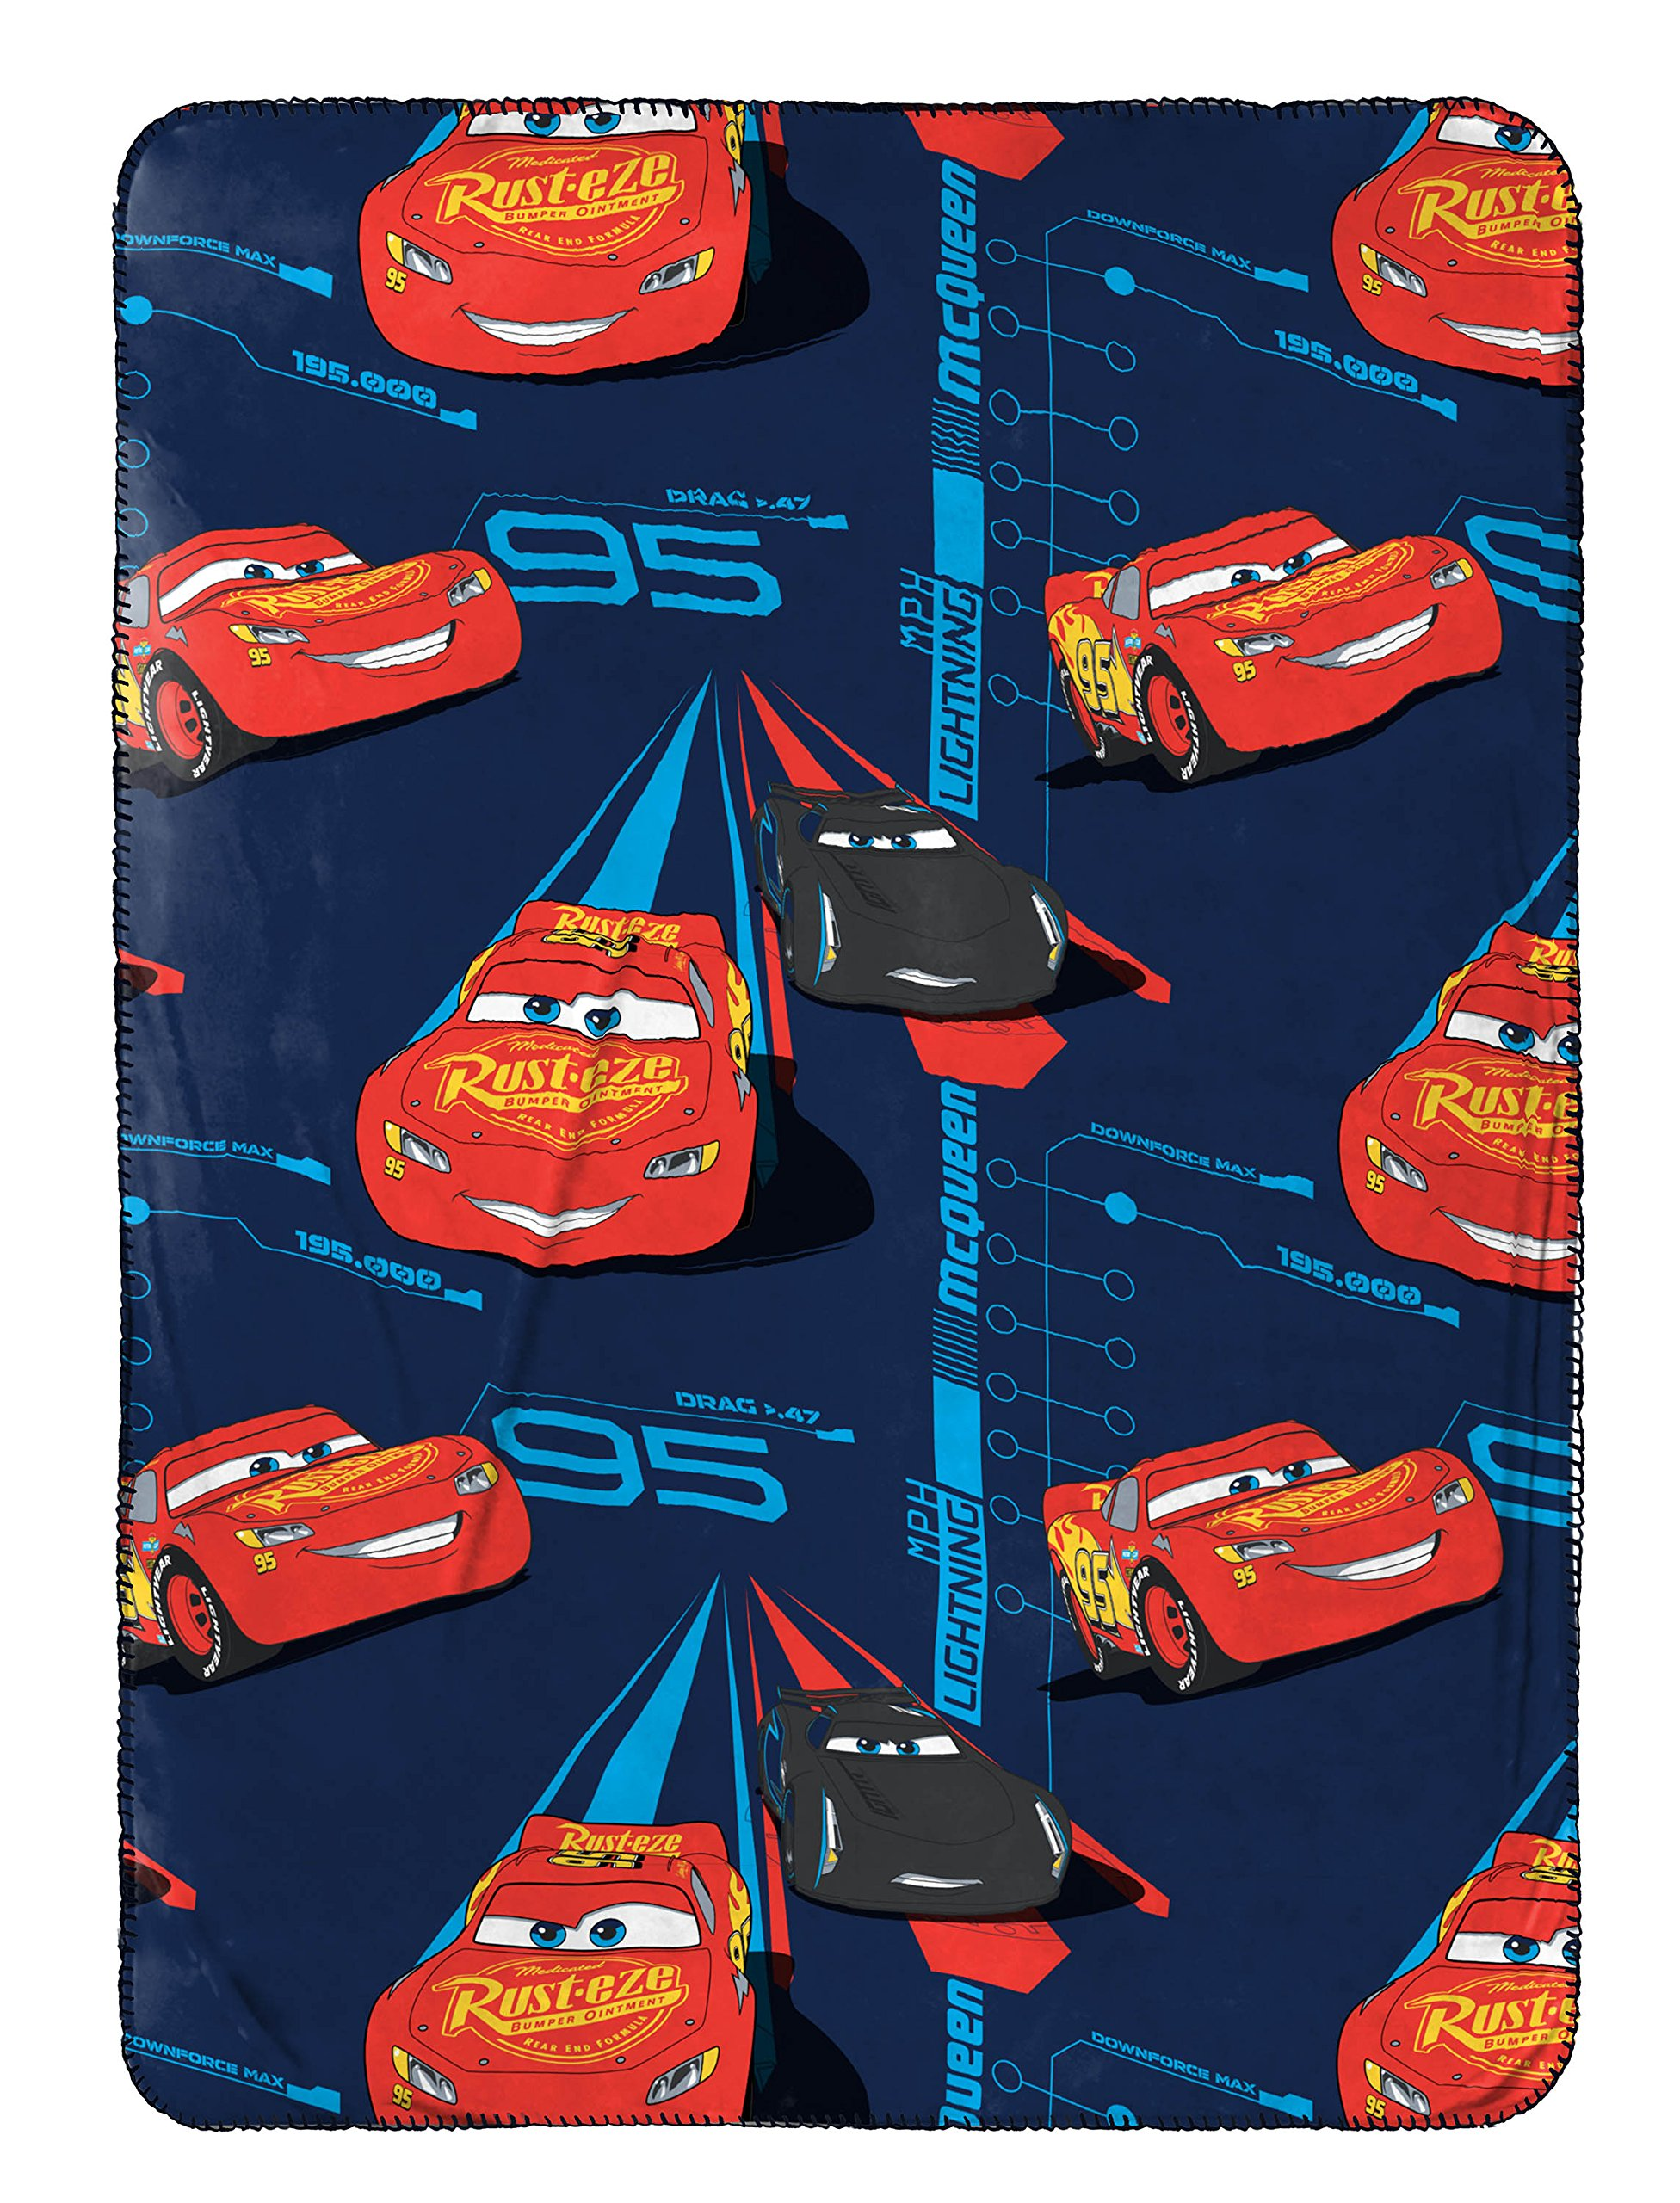 Disney/Pixar Cars 3 Movie Speed Trip Dark Blue 40'' x 50'' Travel Throw Blanket with Lightning McQueen and Jackson Storm (Official Disney/Pixar Product)